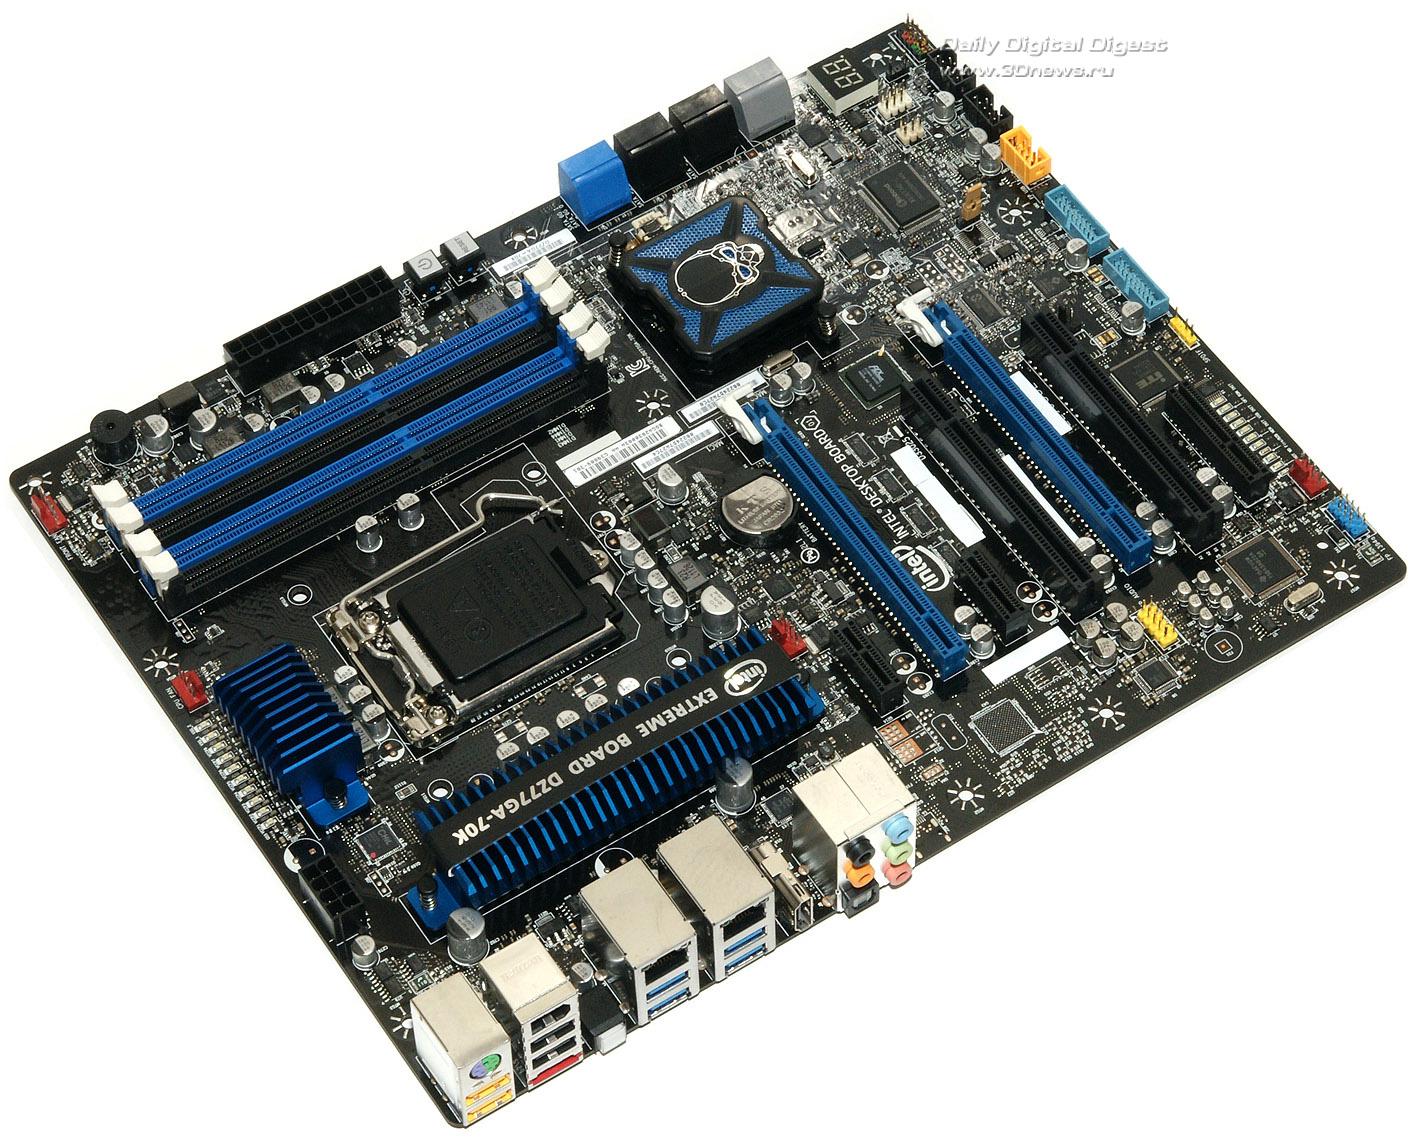 Intel DZ77GA-70K Iflash Windows 8 Driver Download